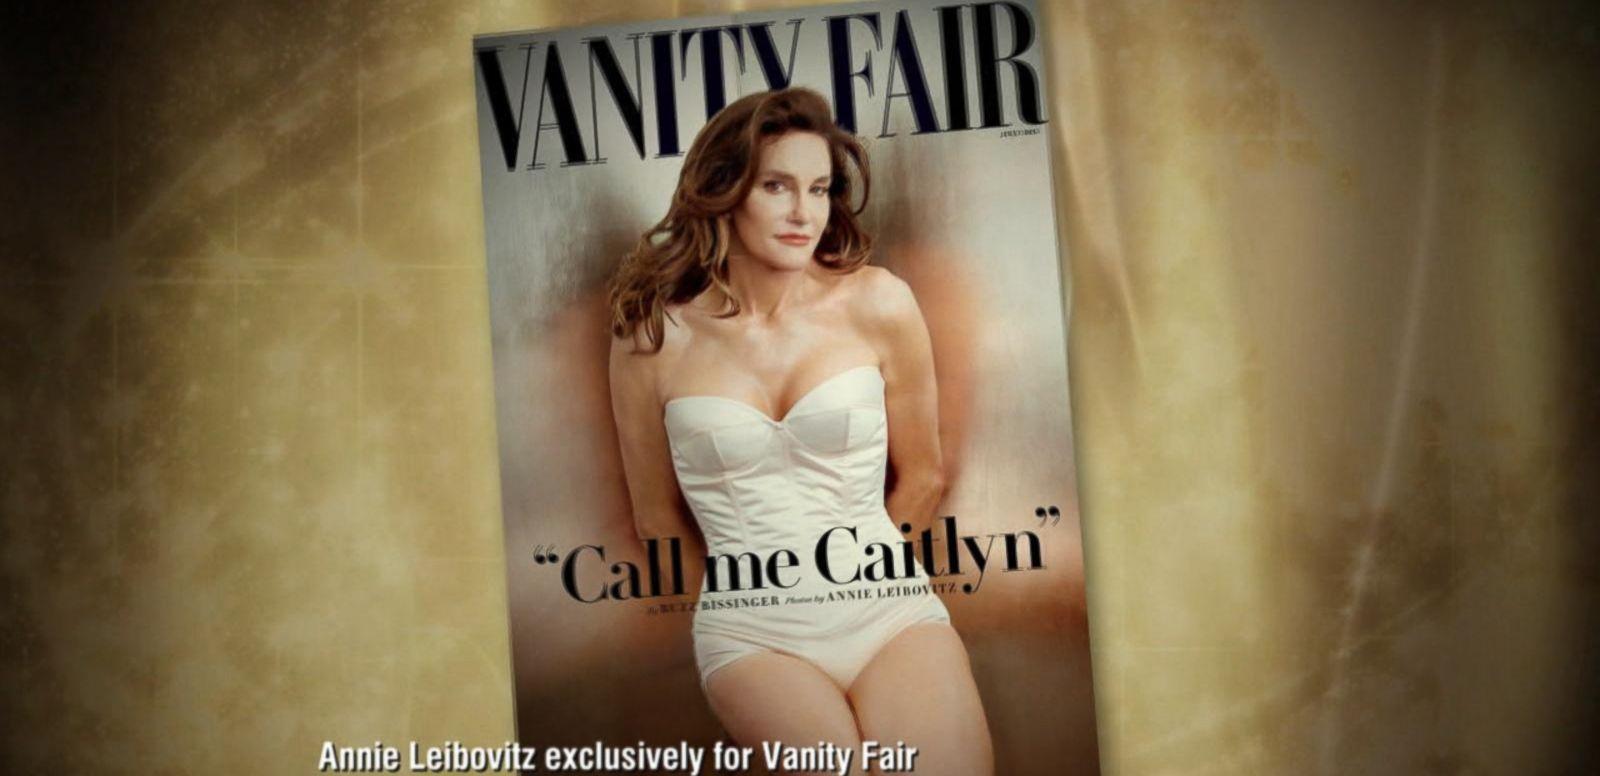 Meet Caitlyn Jenner